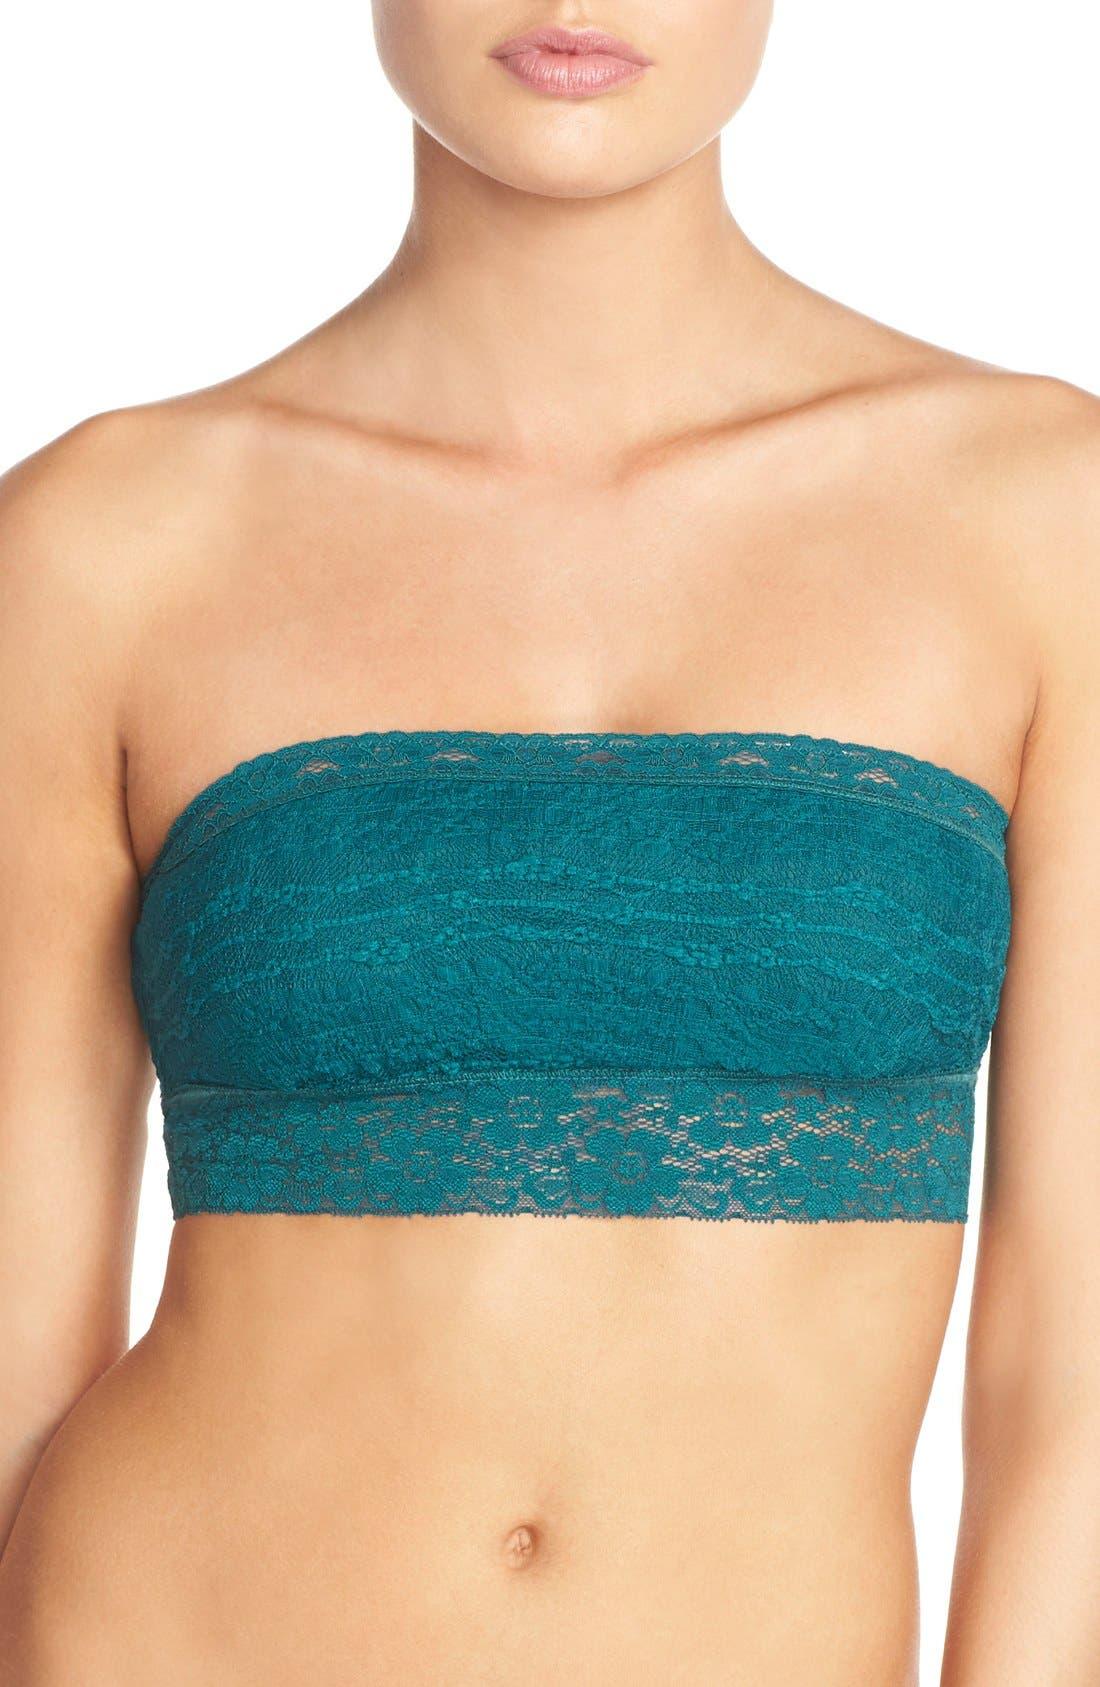 Intimately FP Lace Bandeau Bralette,                         Main,                         color, OCEAN